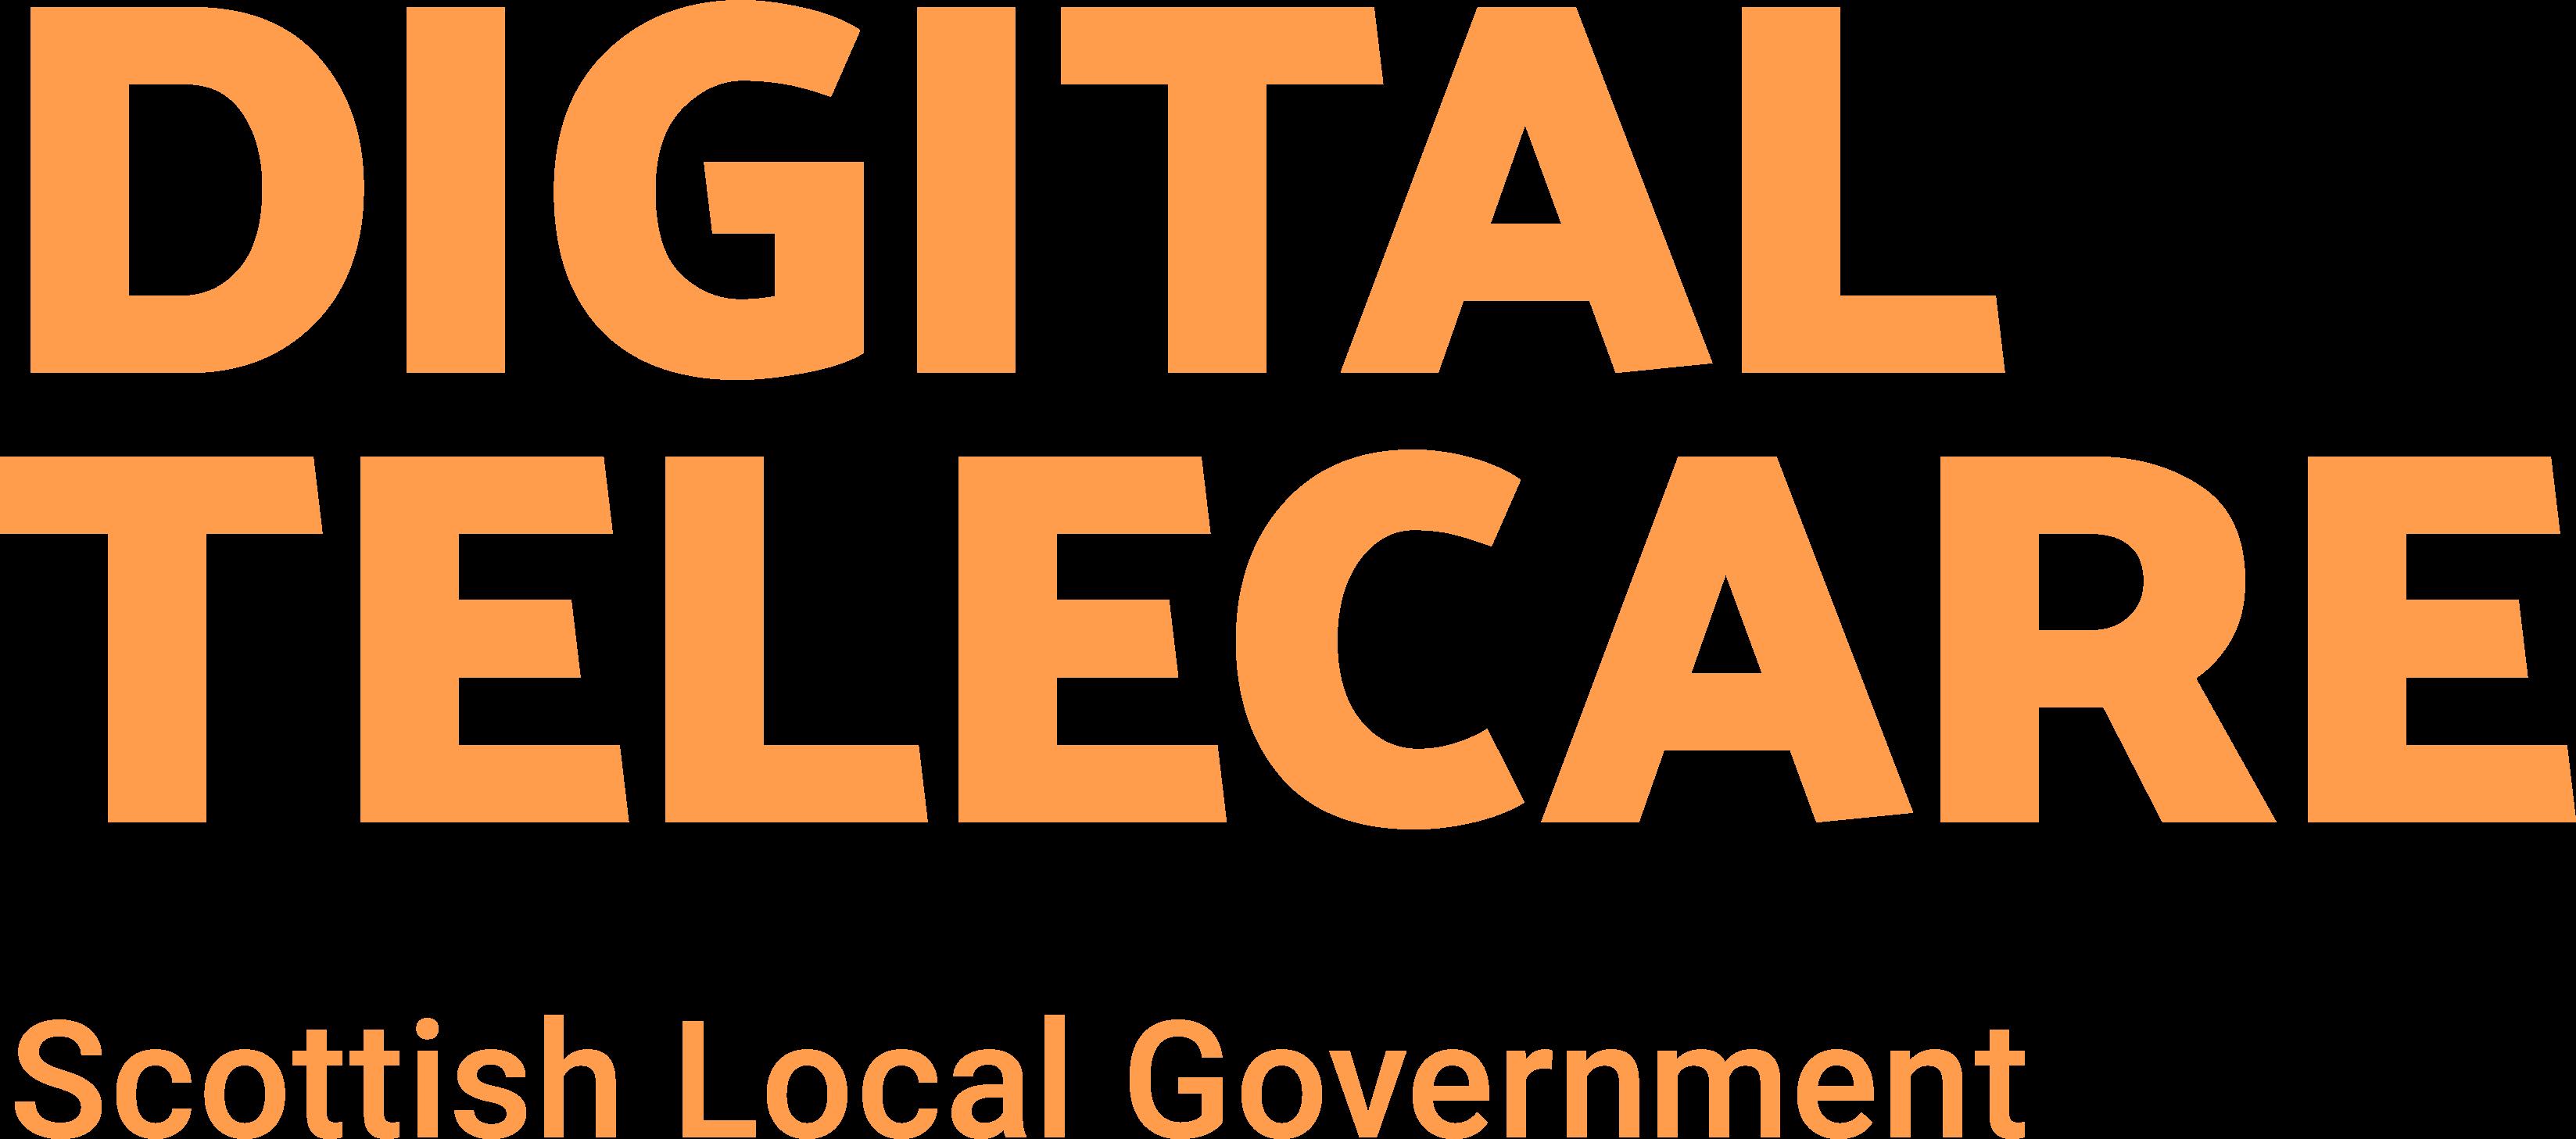 Scottish Local Government Digital Telecare Office website